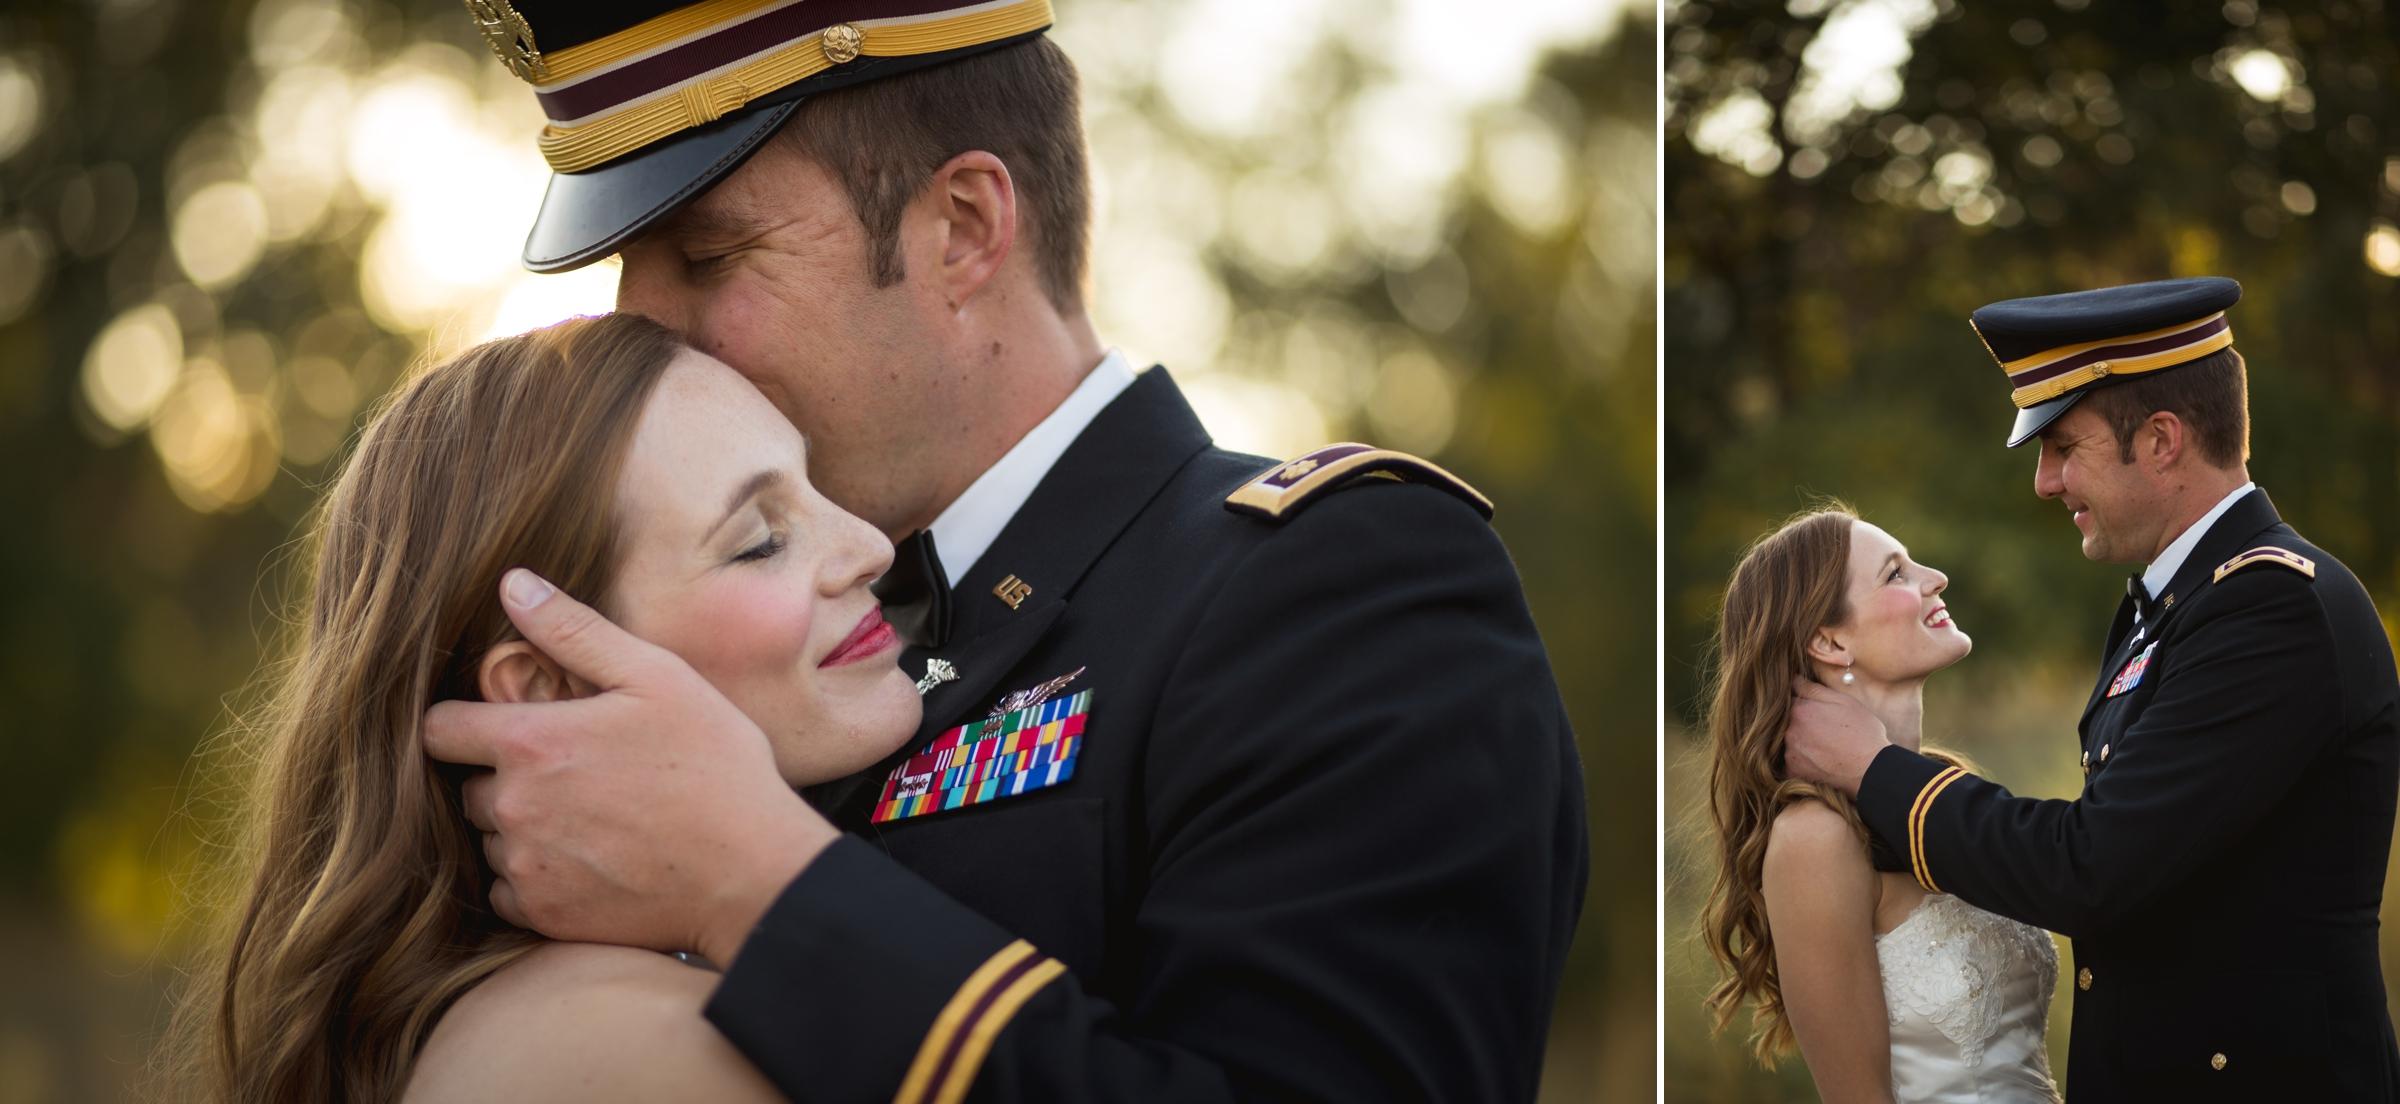 amazing couples photographer